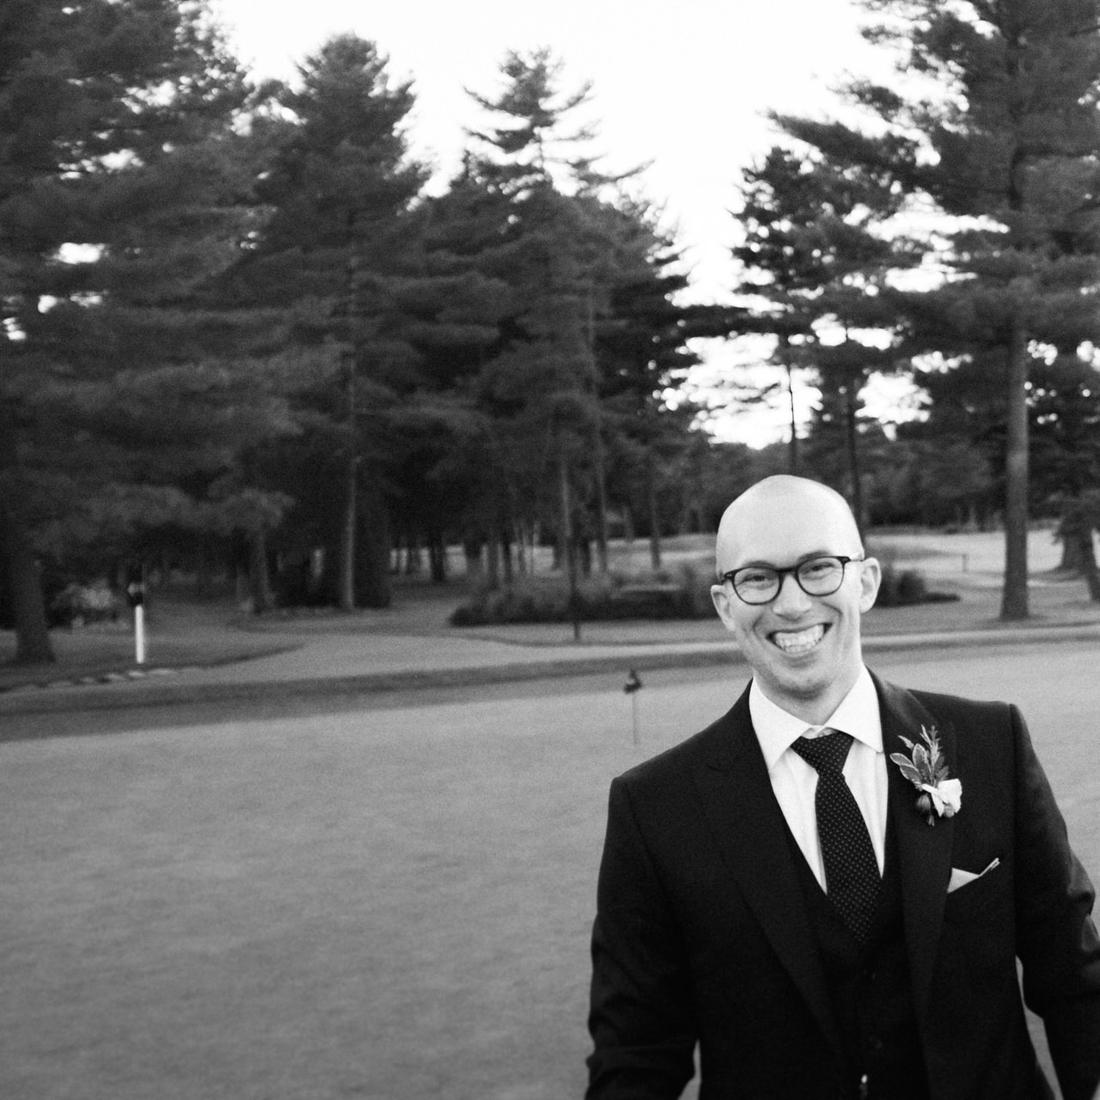 Swedish Groom wedding portrait at Golf Le Mirage, Montreal.jpg